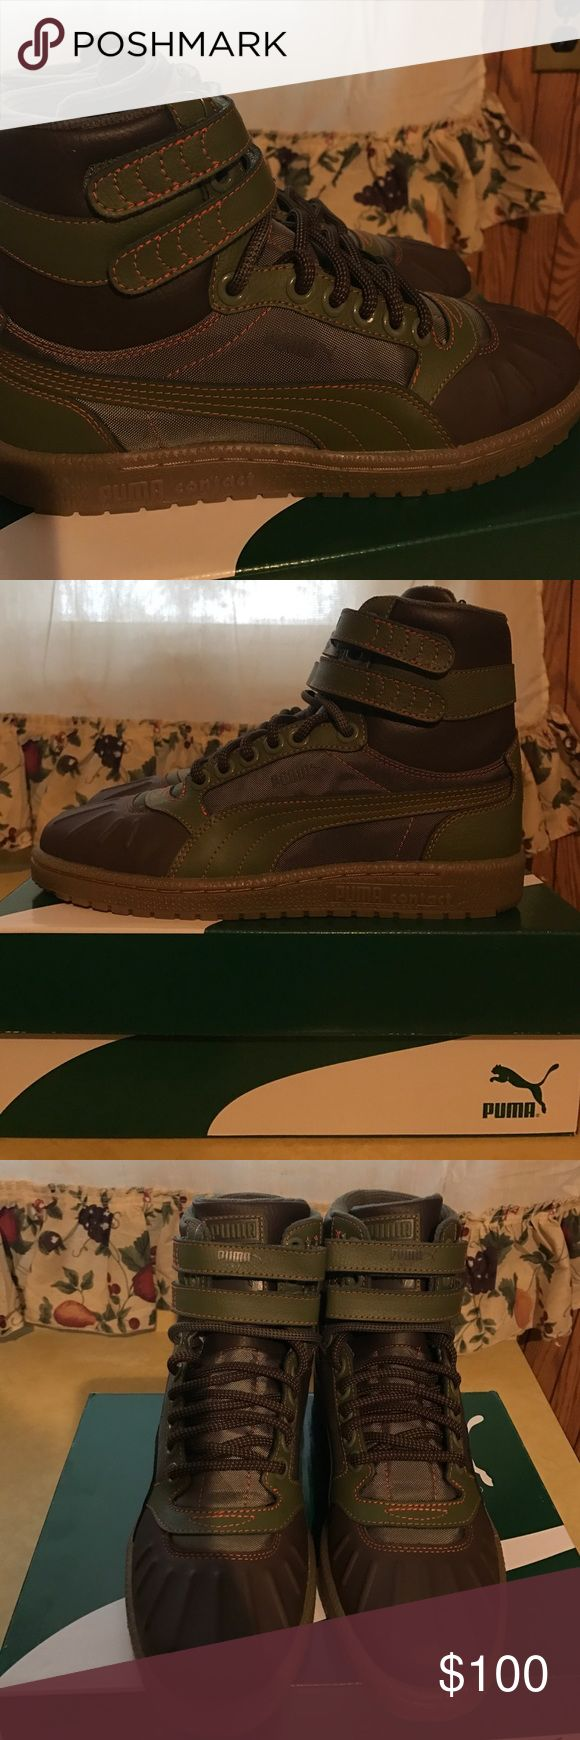 Puma Men's Ski ll Hi Duck Boot Size 7 Brand New Puma Ski ll Hi Duck Boot. Size 7 Men's Puma Shoes Boots